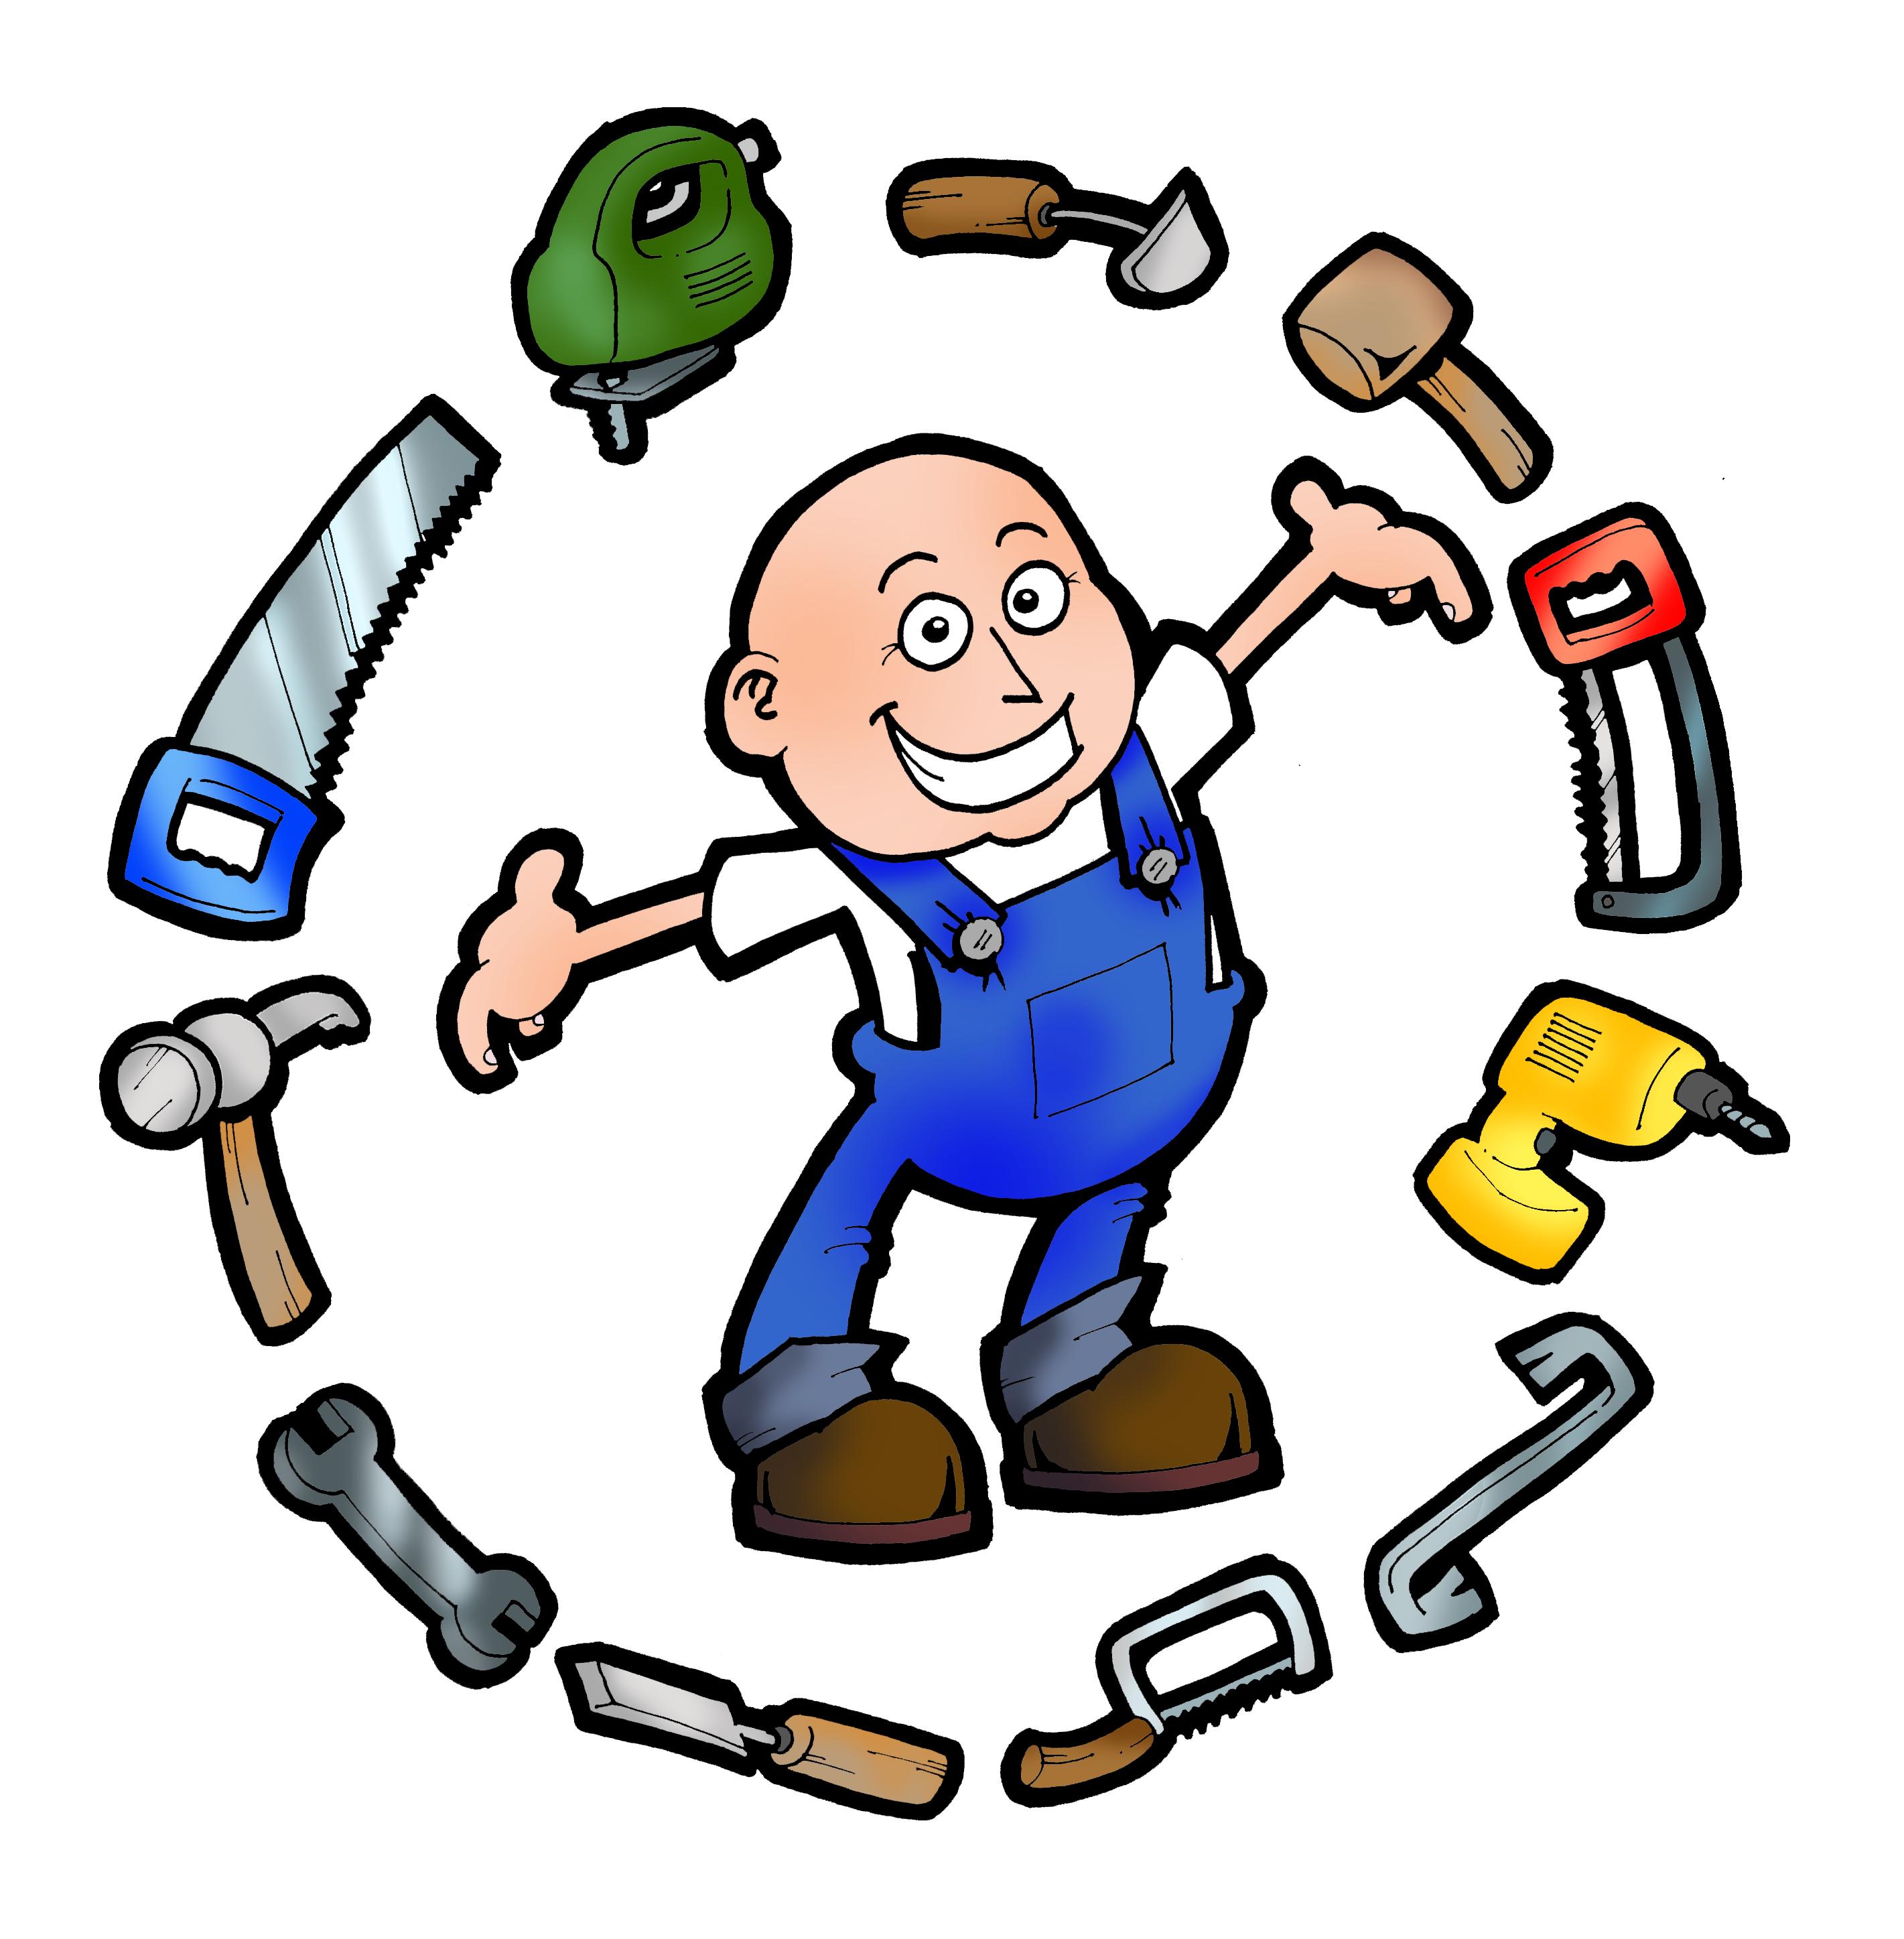 Handy man clipart jpg freeuse download Free Handyman Cliparts, Download Free Clip Art, Free Clip Art on ... jpg freeuse download